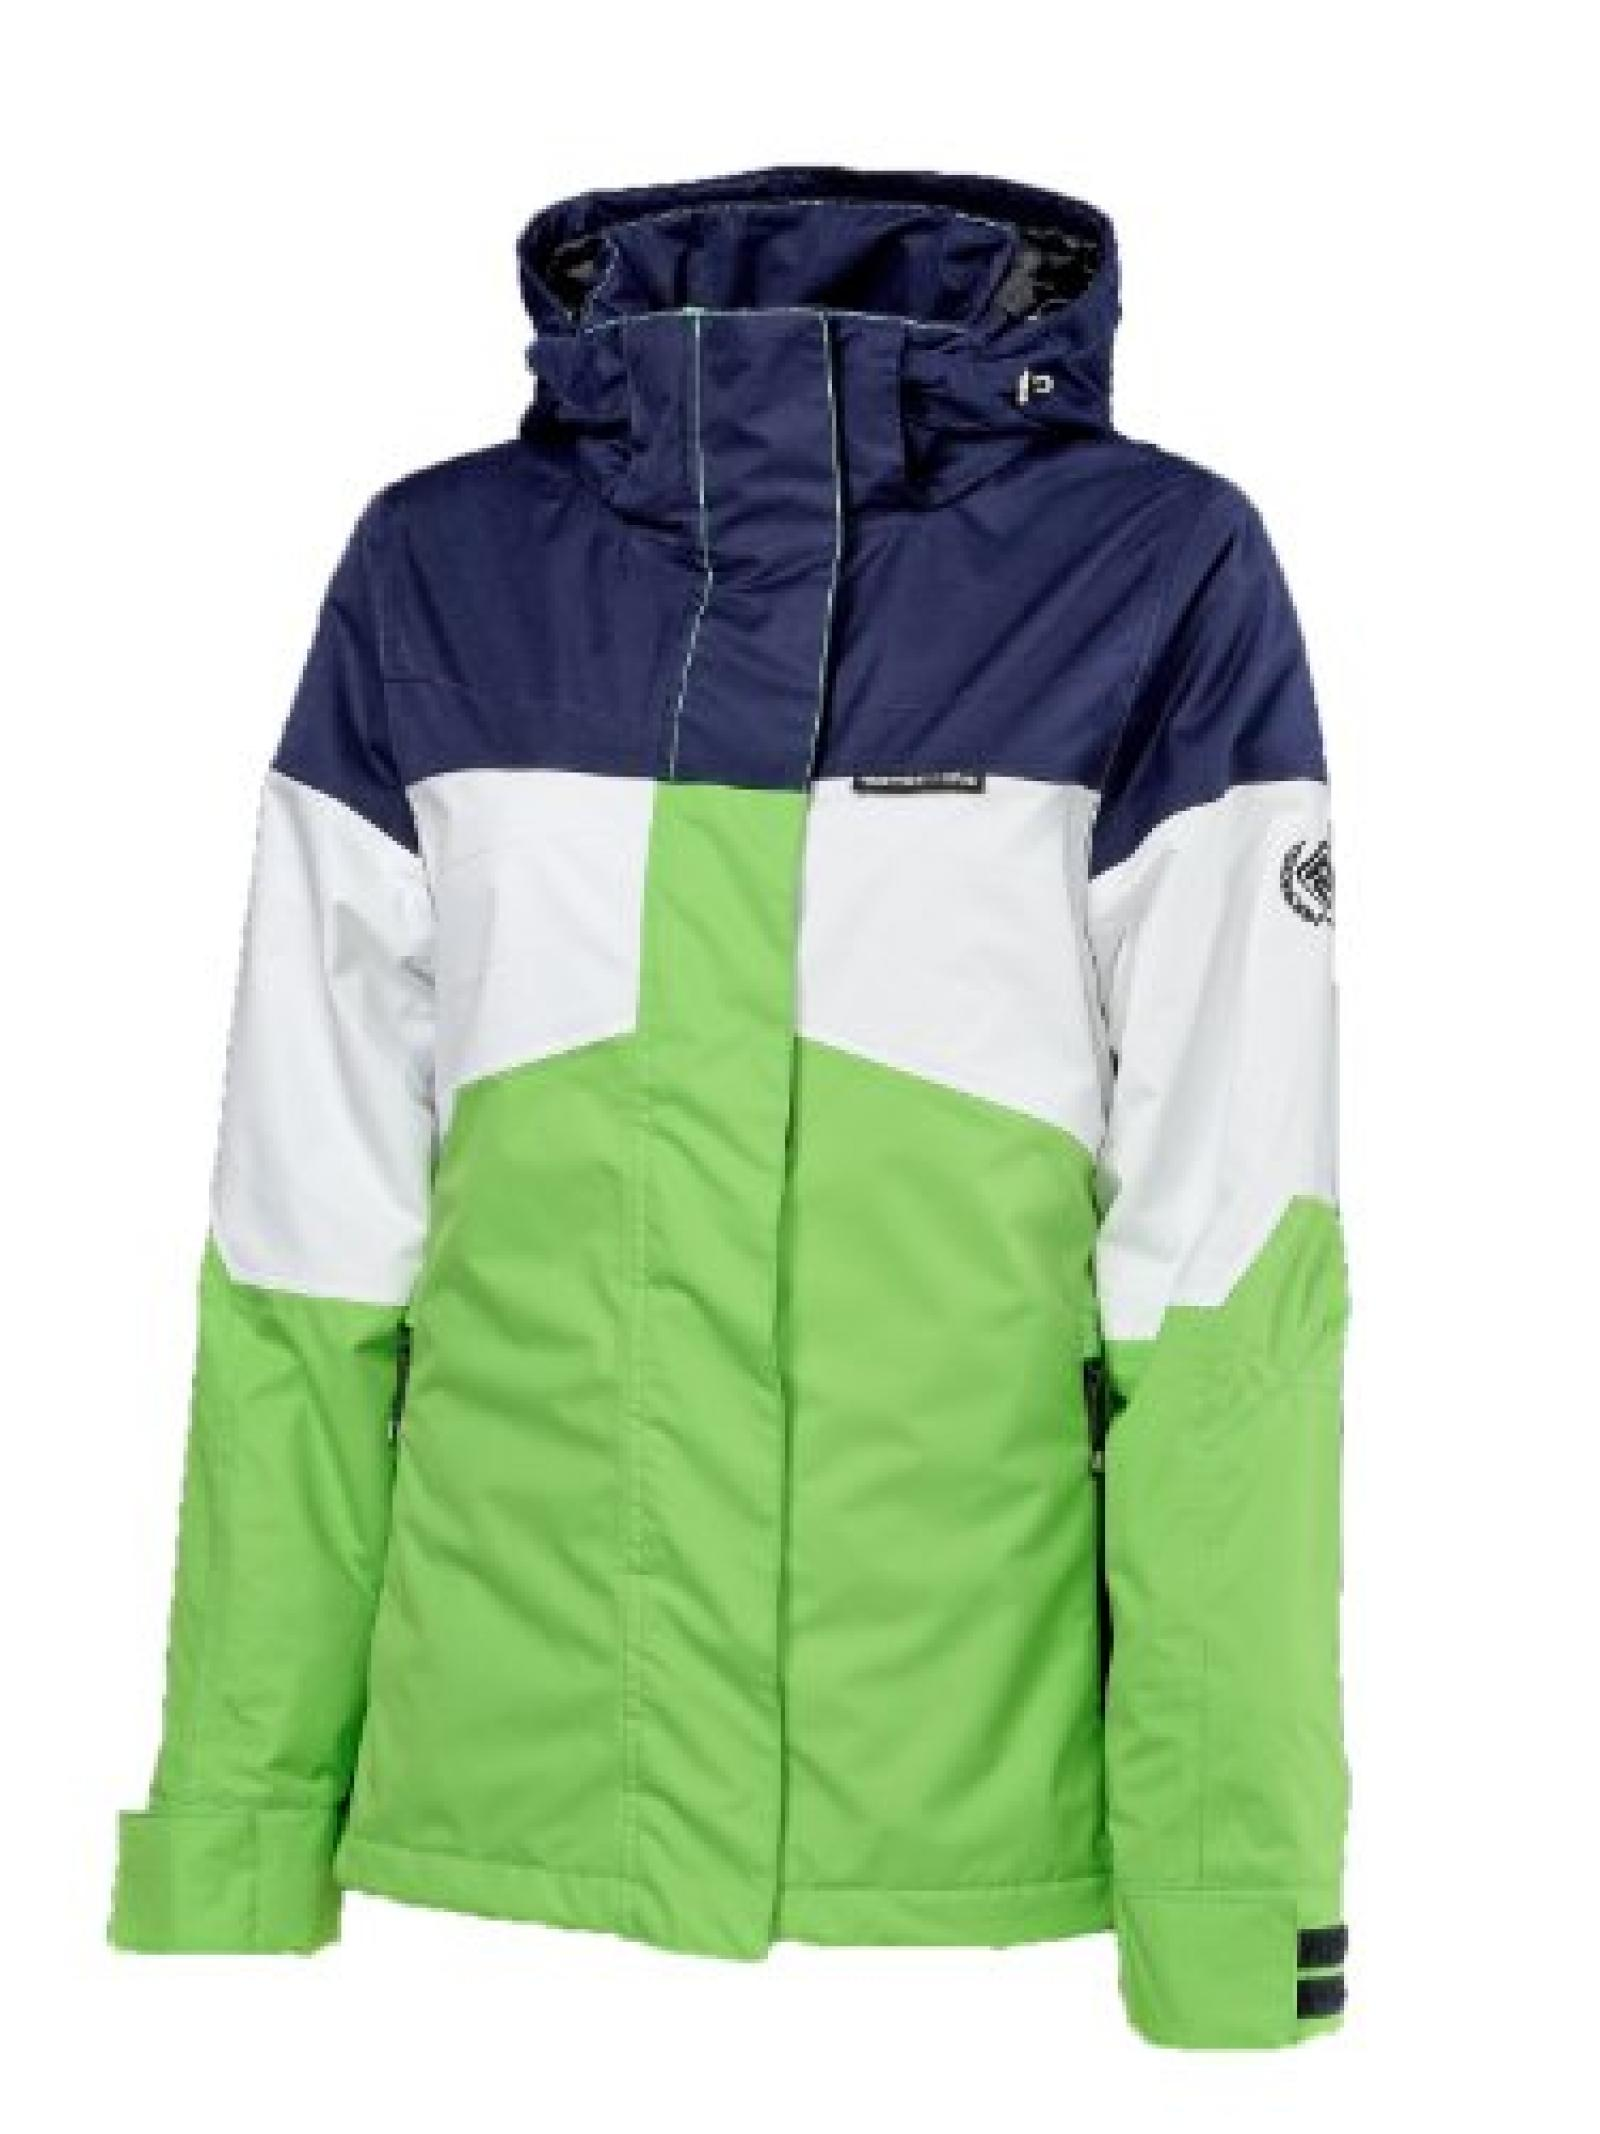 Rehall SUNPEAK Jacket Damen Ski- und Snowboardjacke solid lime kombi